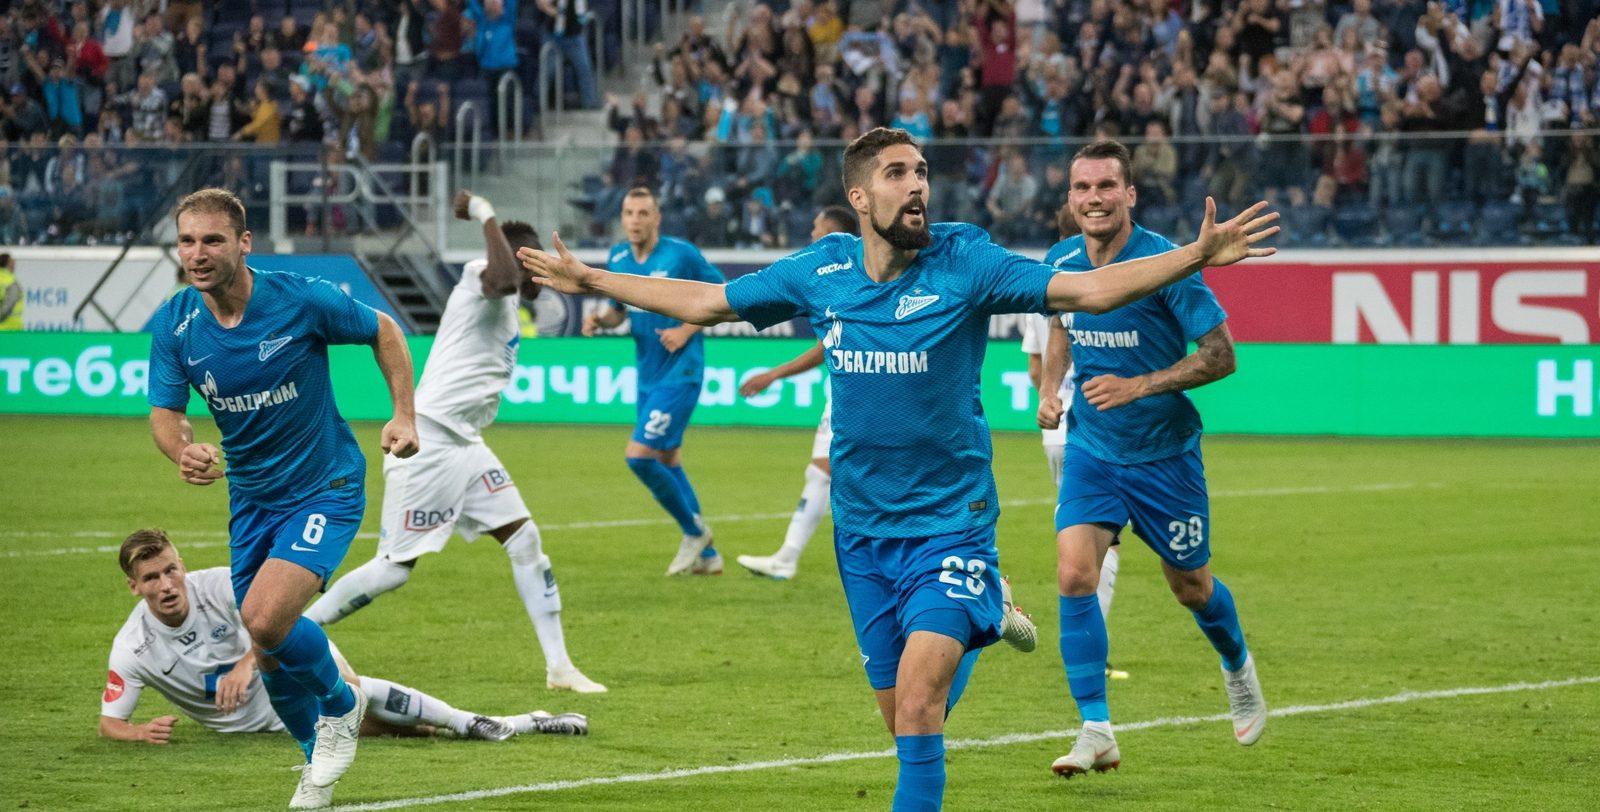 Динамо-Брест – Неман. Прогноз на матч 07.07.2018